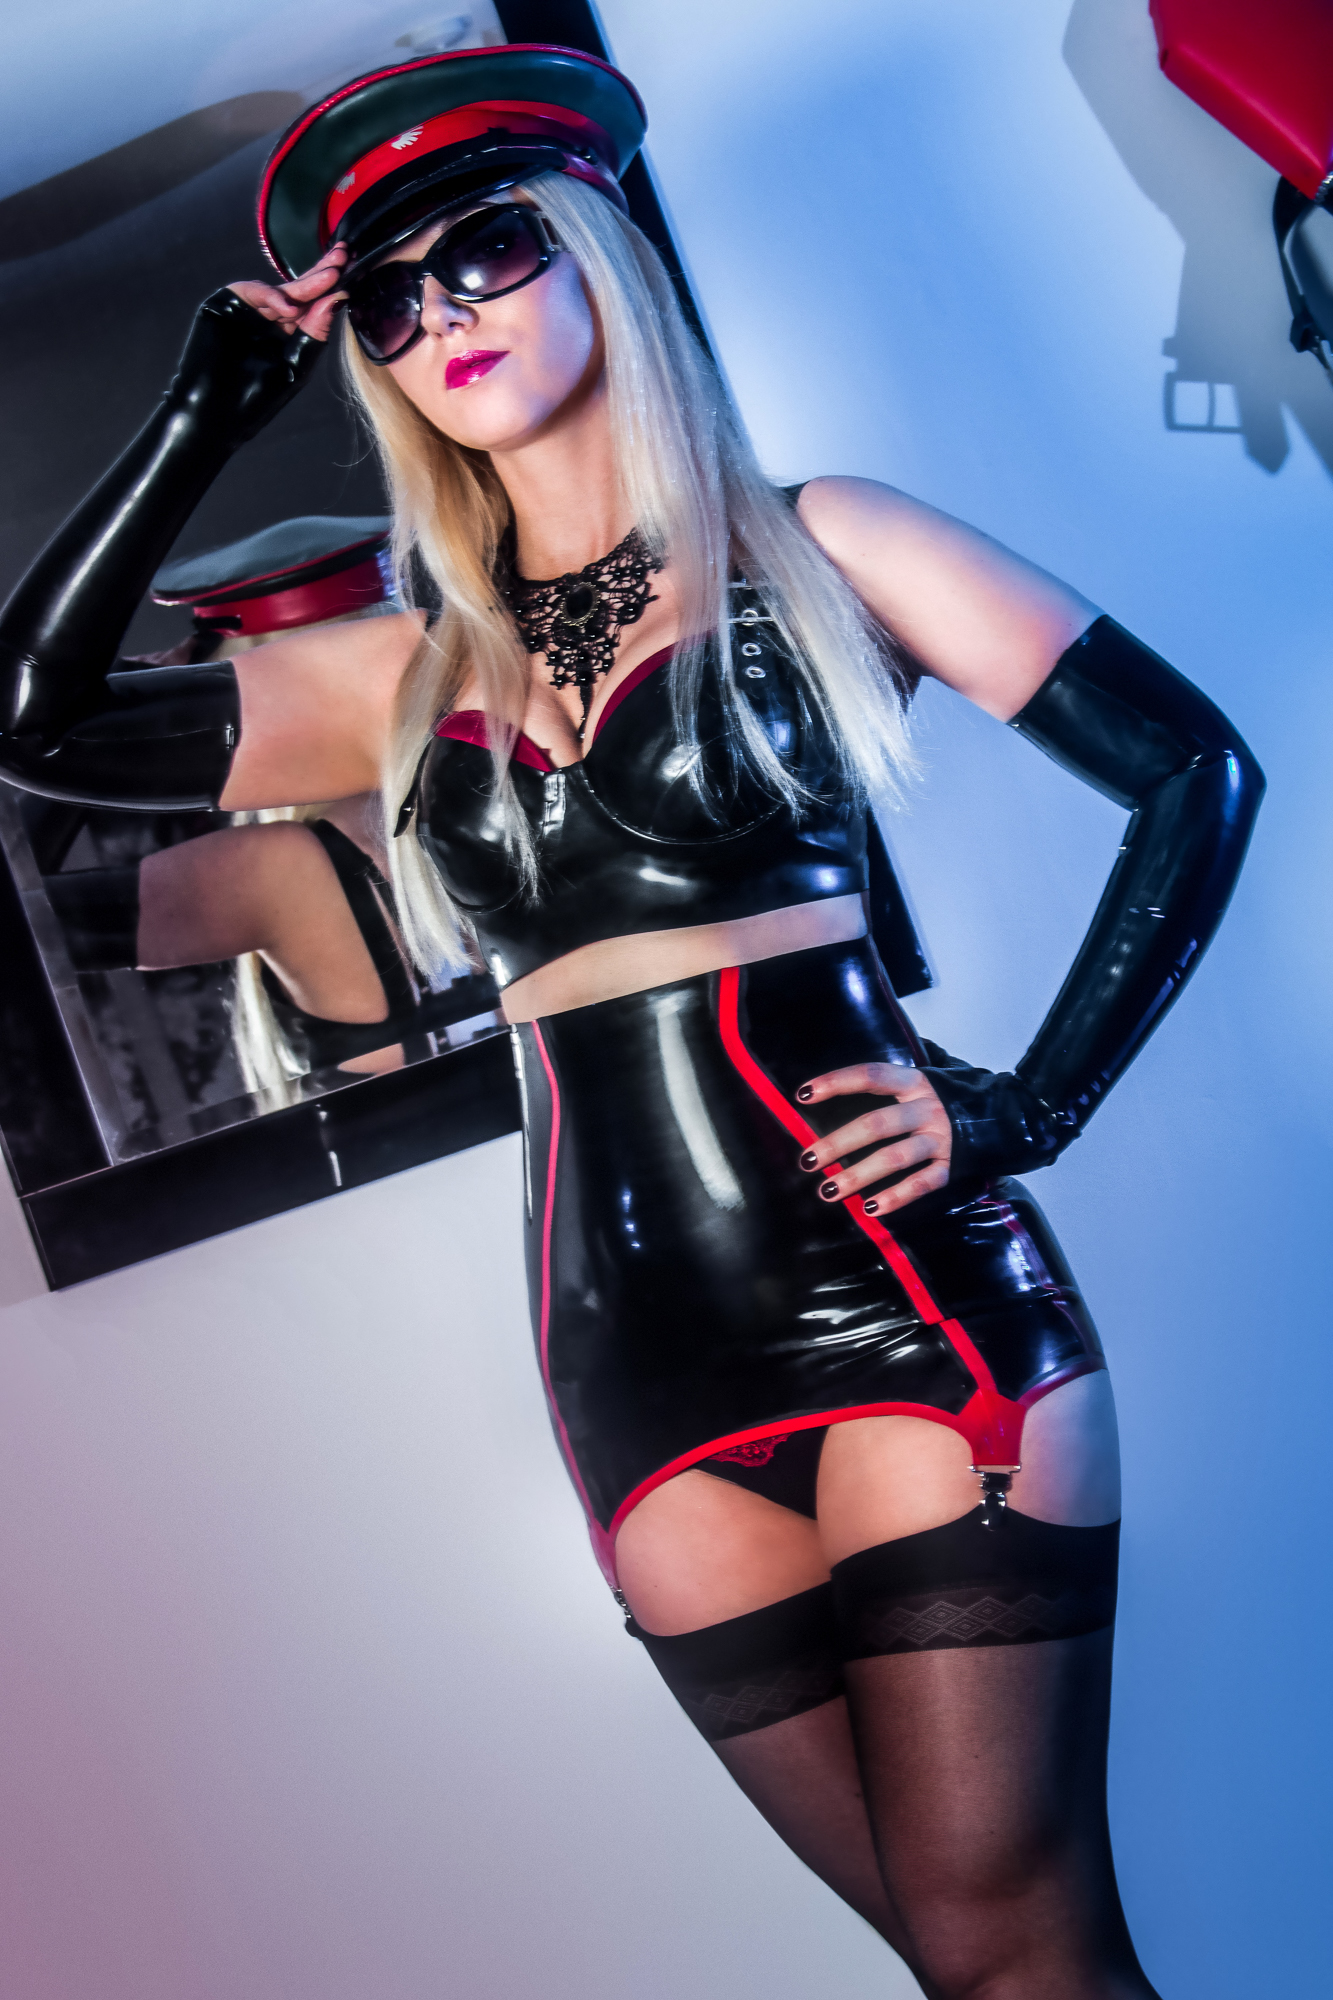 London Mistress Wildfire wearing beautiful latex outfit